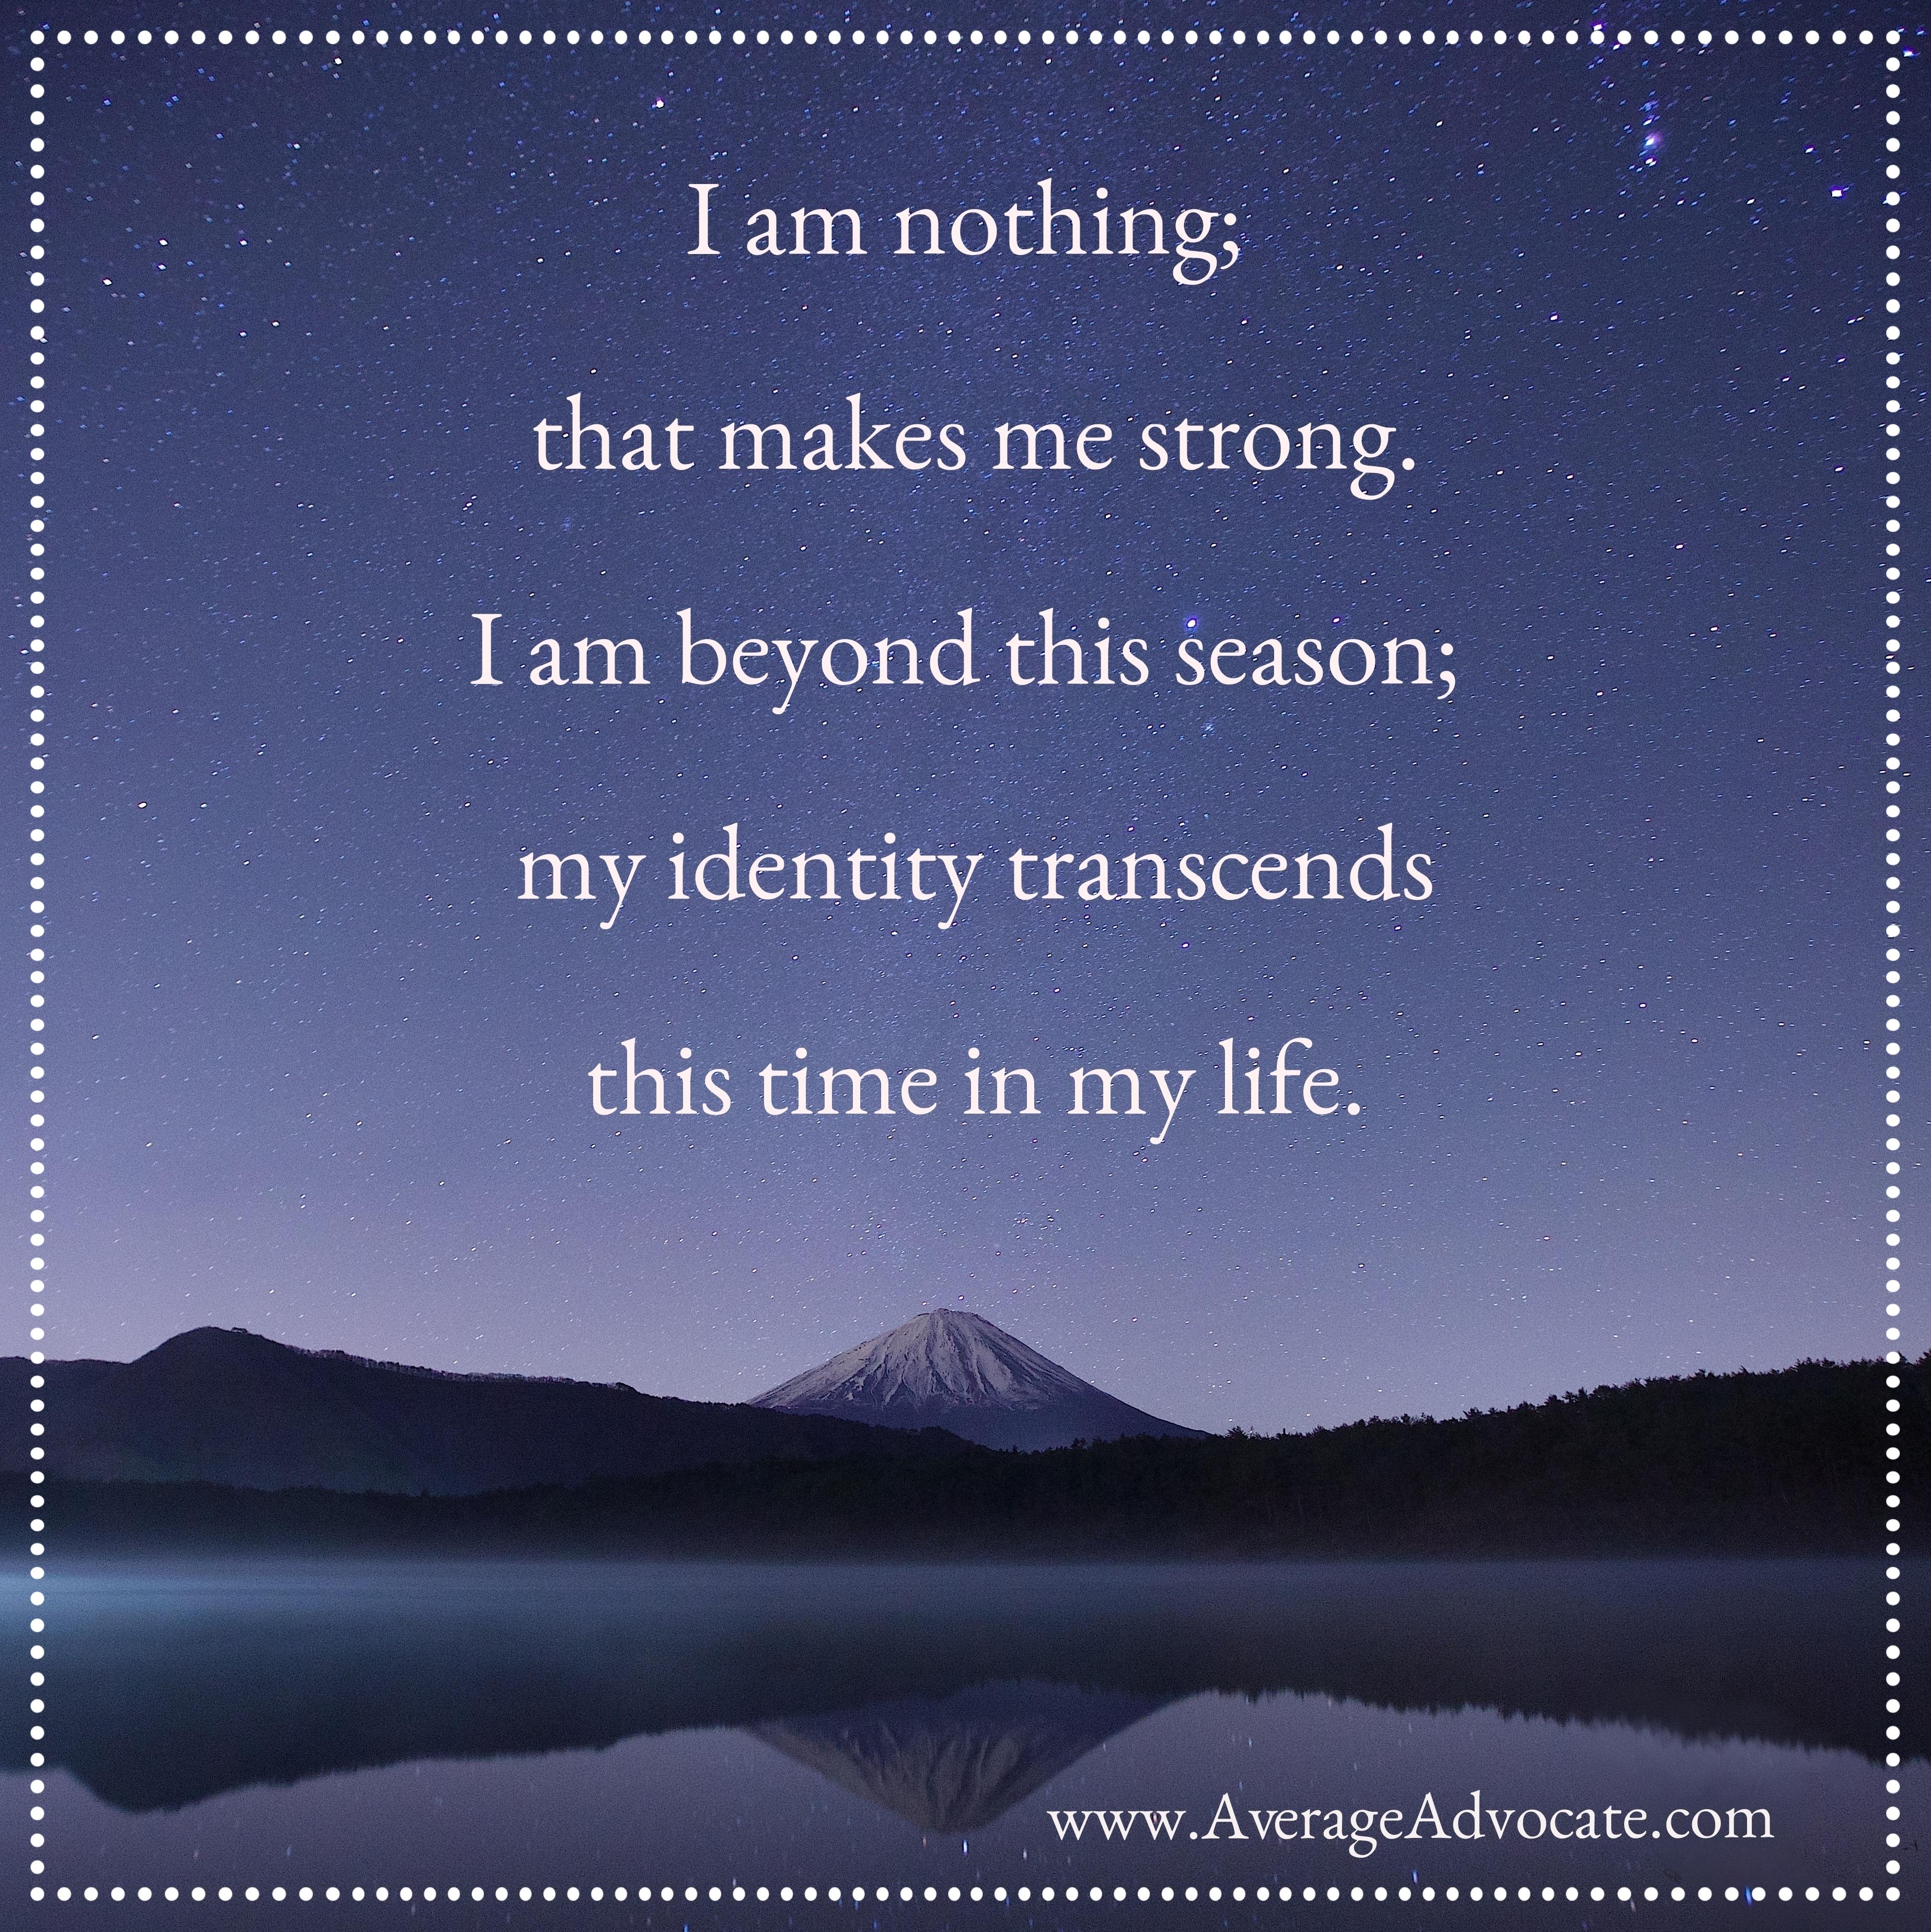 I am nothing My Identity Transcends www.AverageAdvocate.com